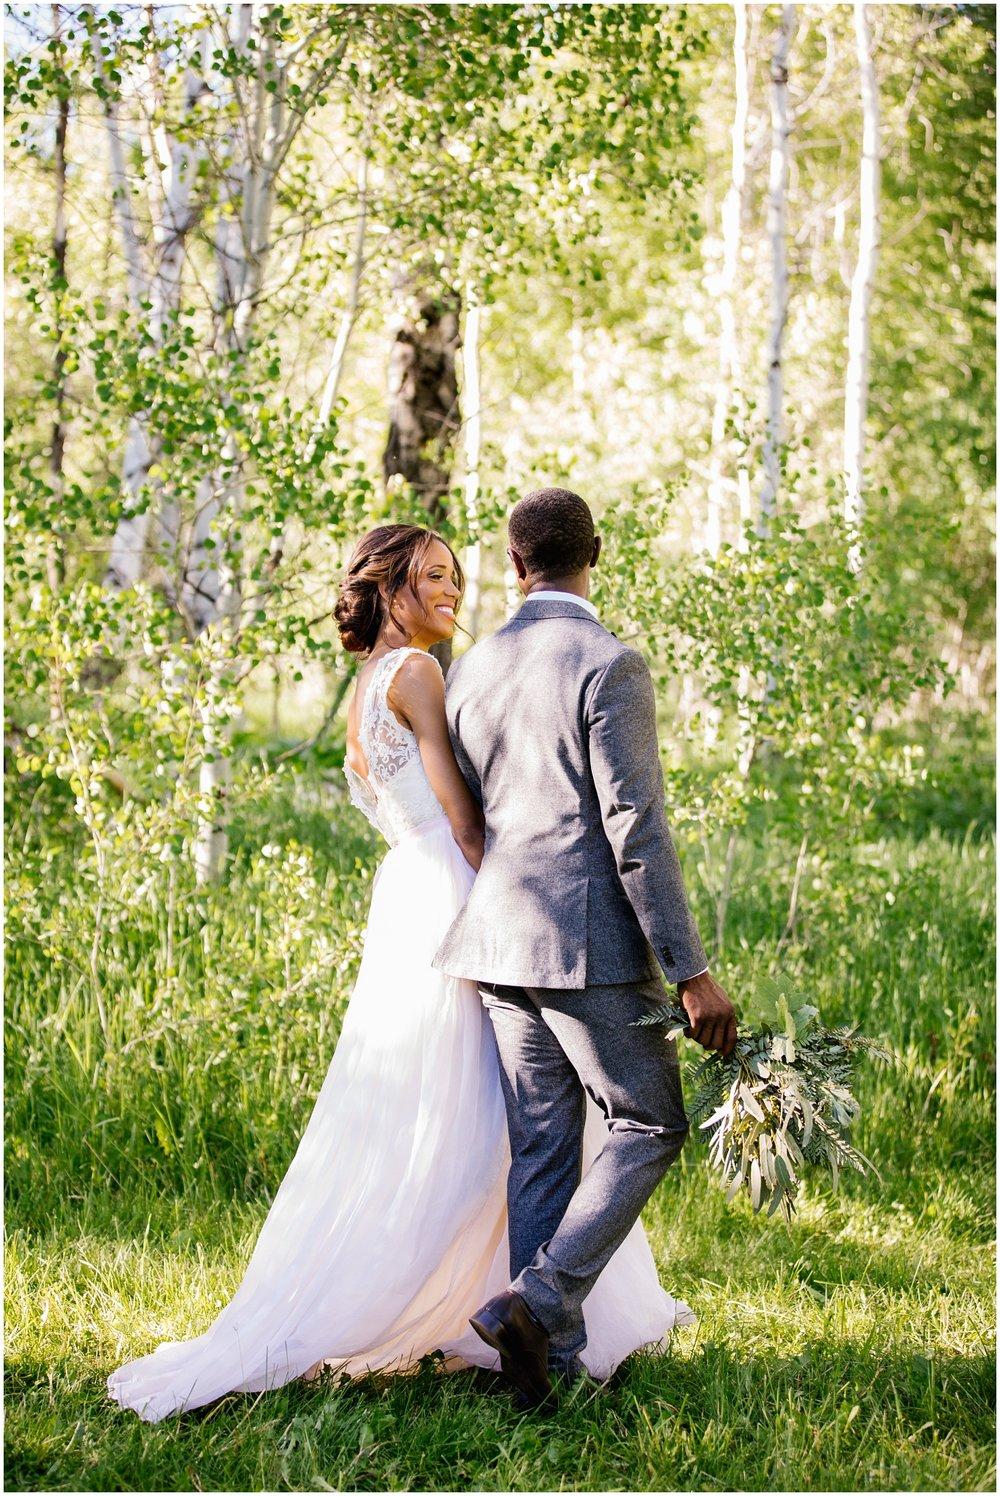 TreeHorseShoot-19_Lizzie-B-Imagery-Utah-Wedding-Photographer-Salt-Lake-City-Park-City-Oakley.jpg